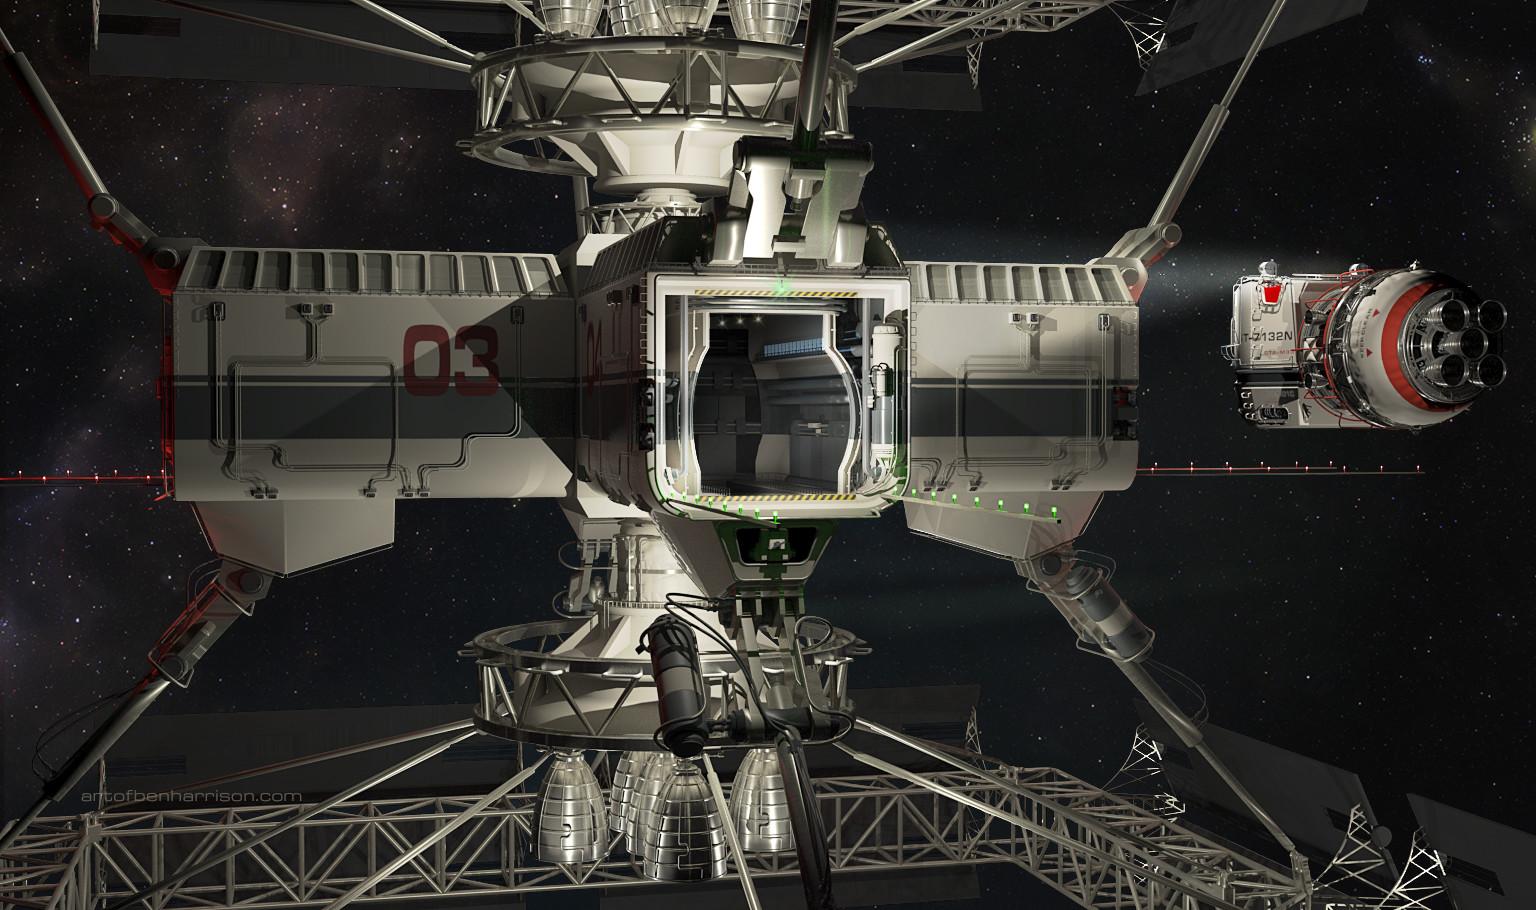 Ben harrison docking station02